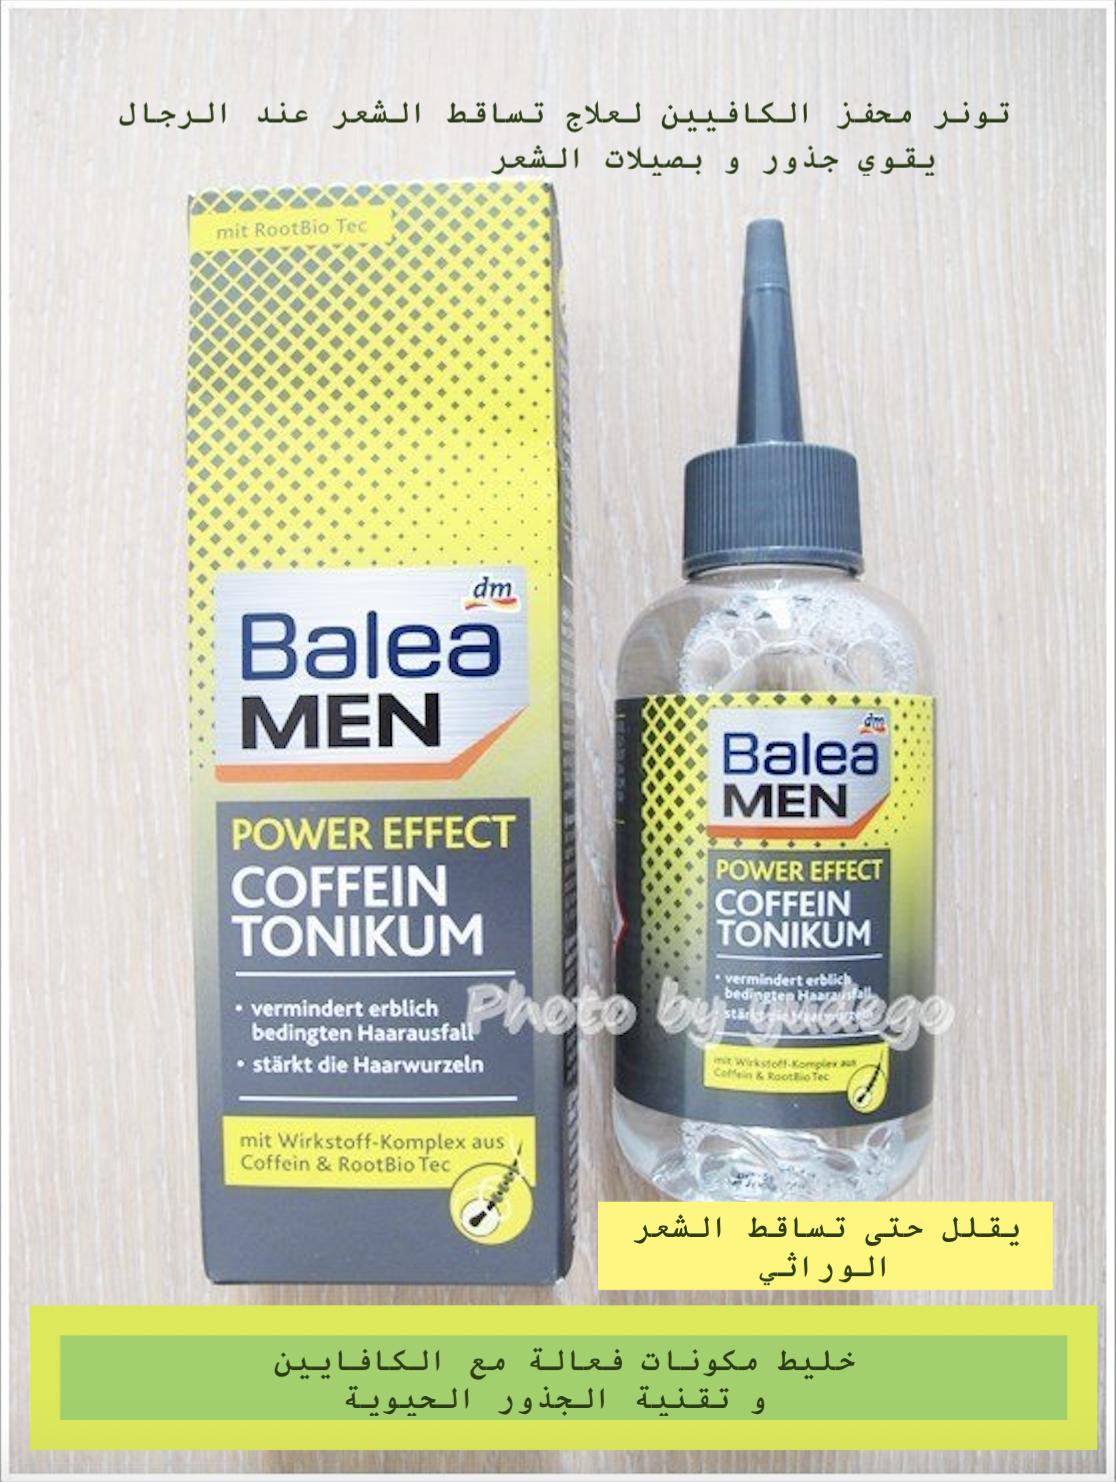 B405 men power effect coffein tonikum 150ml سائل باليه المحفز 00443